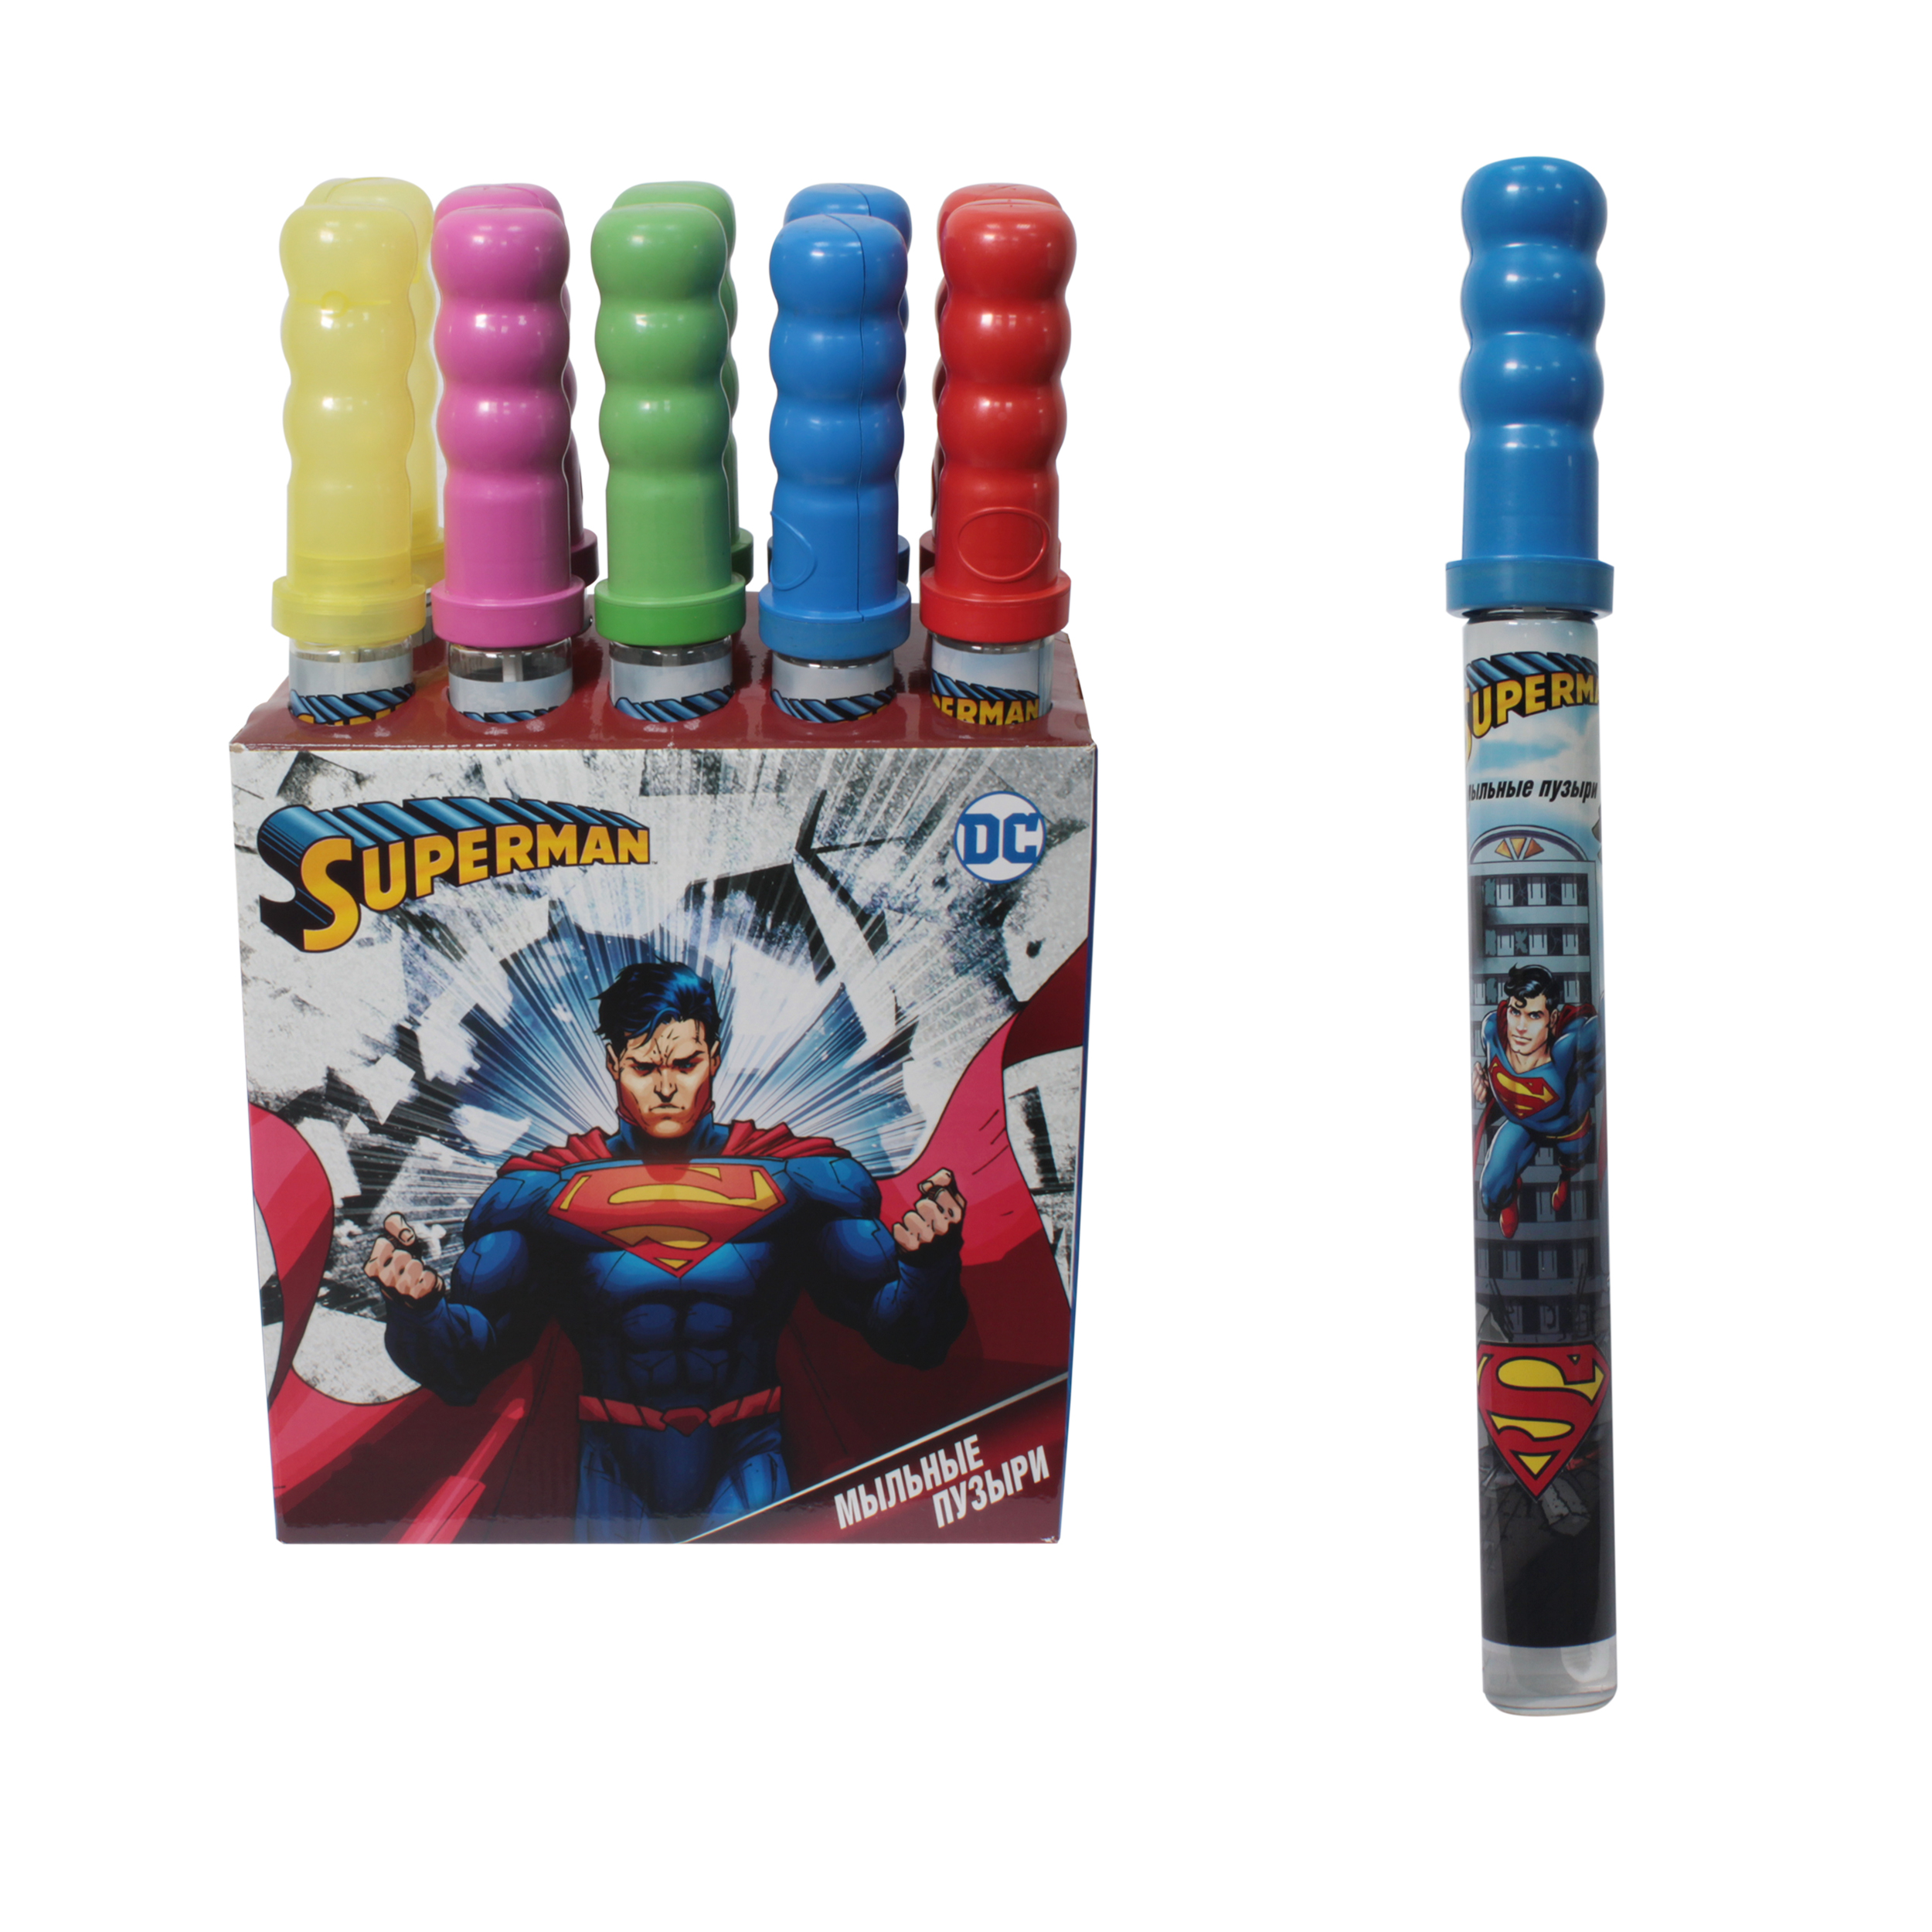 "Мыльные пузыри ""Супермен"", 200 мл"